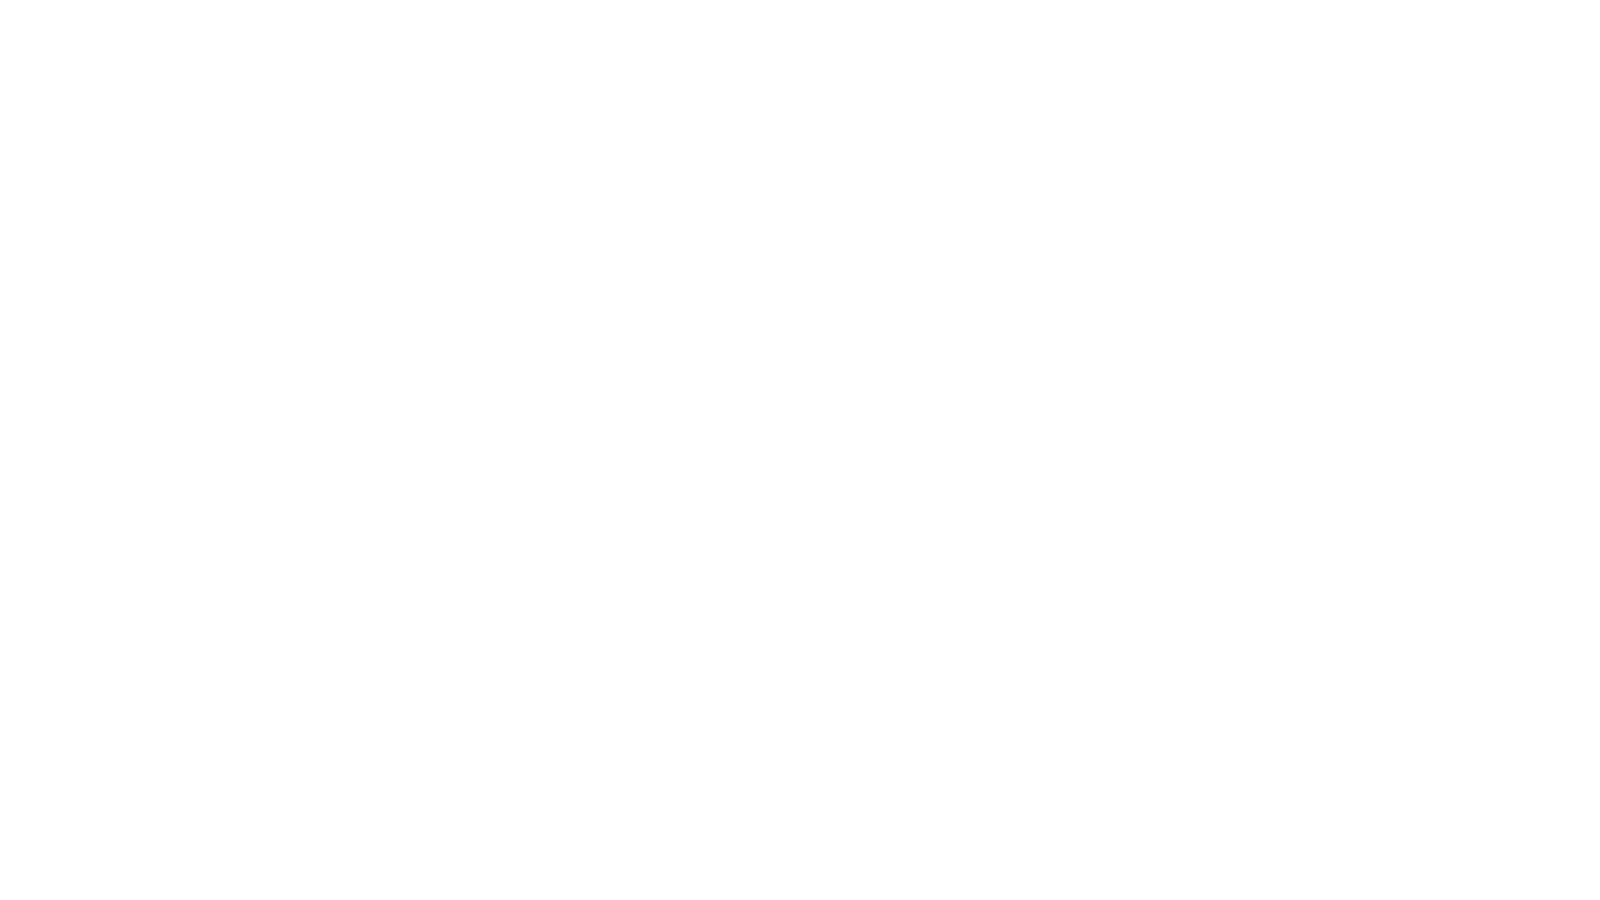 bg-1600